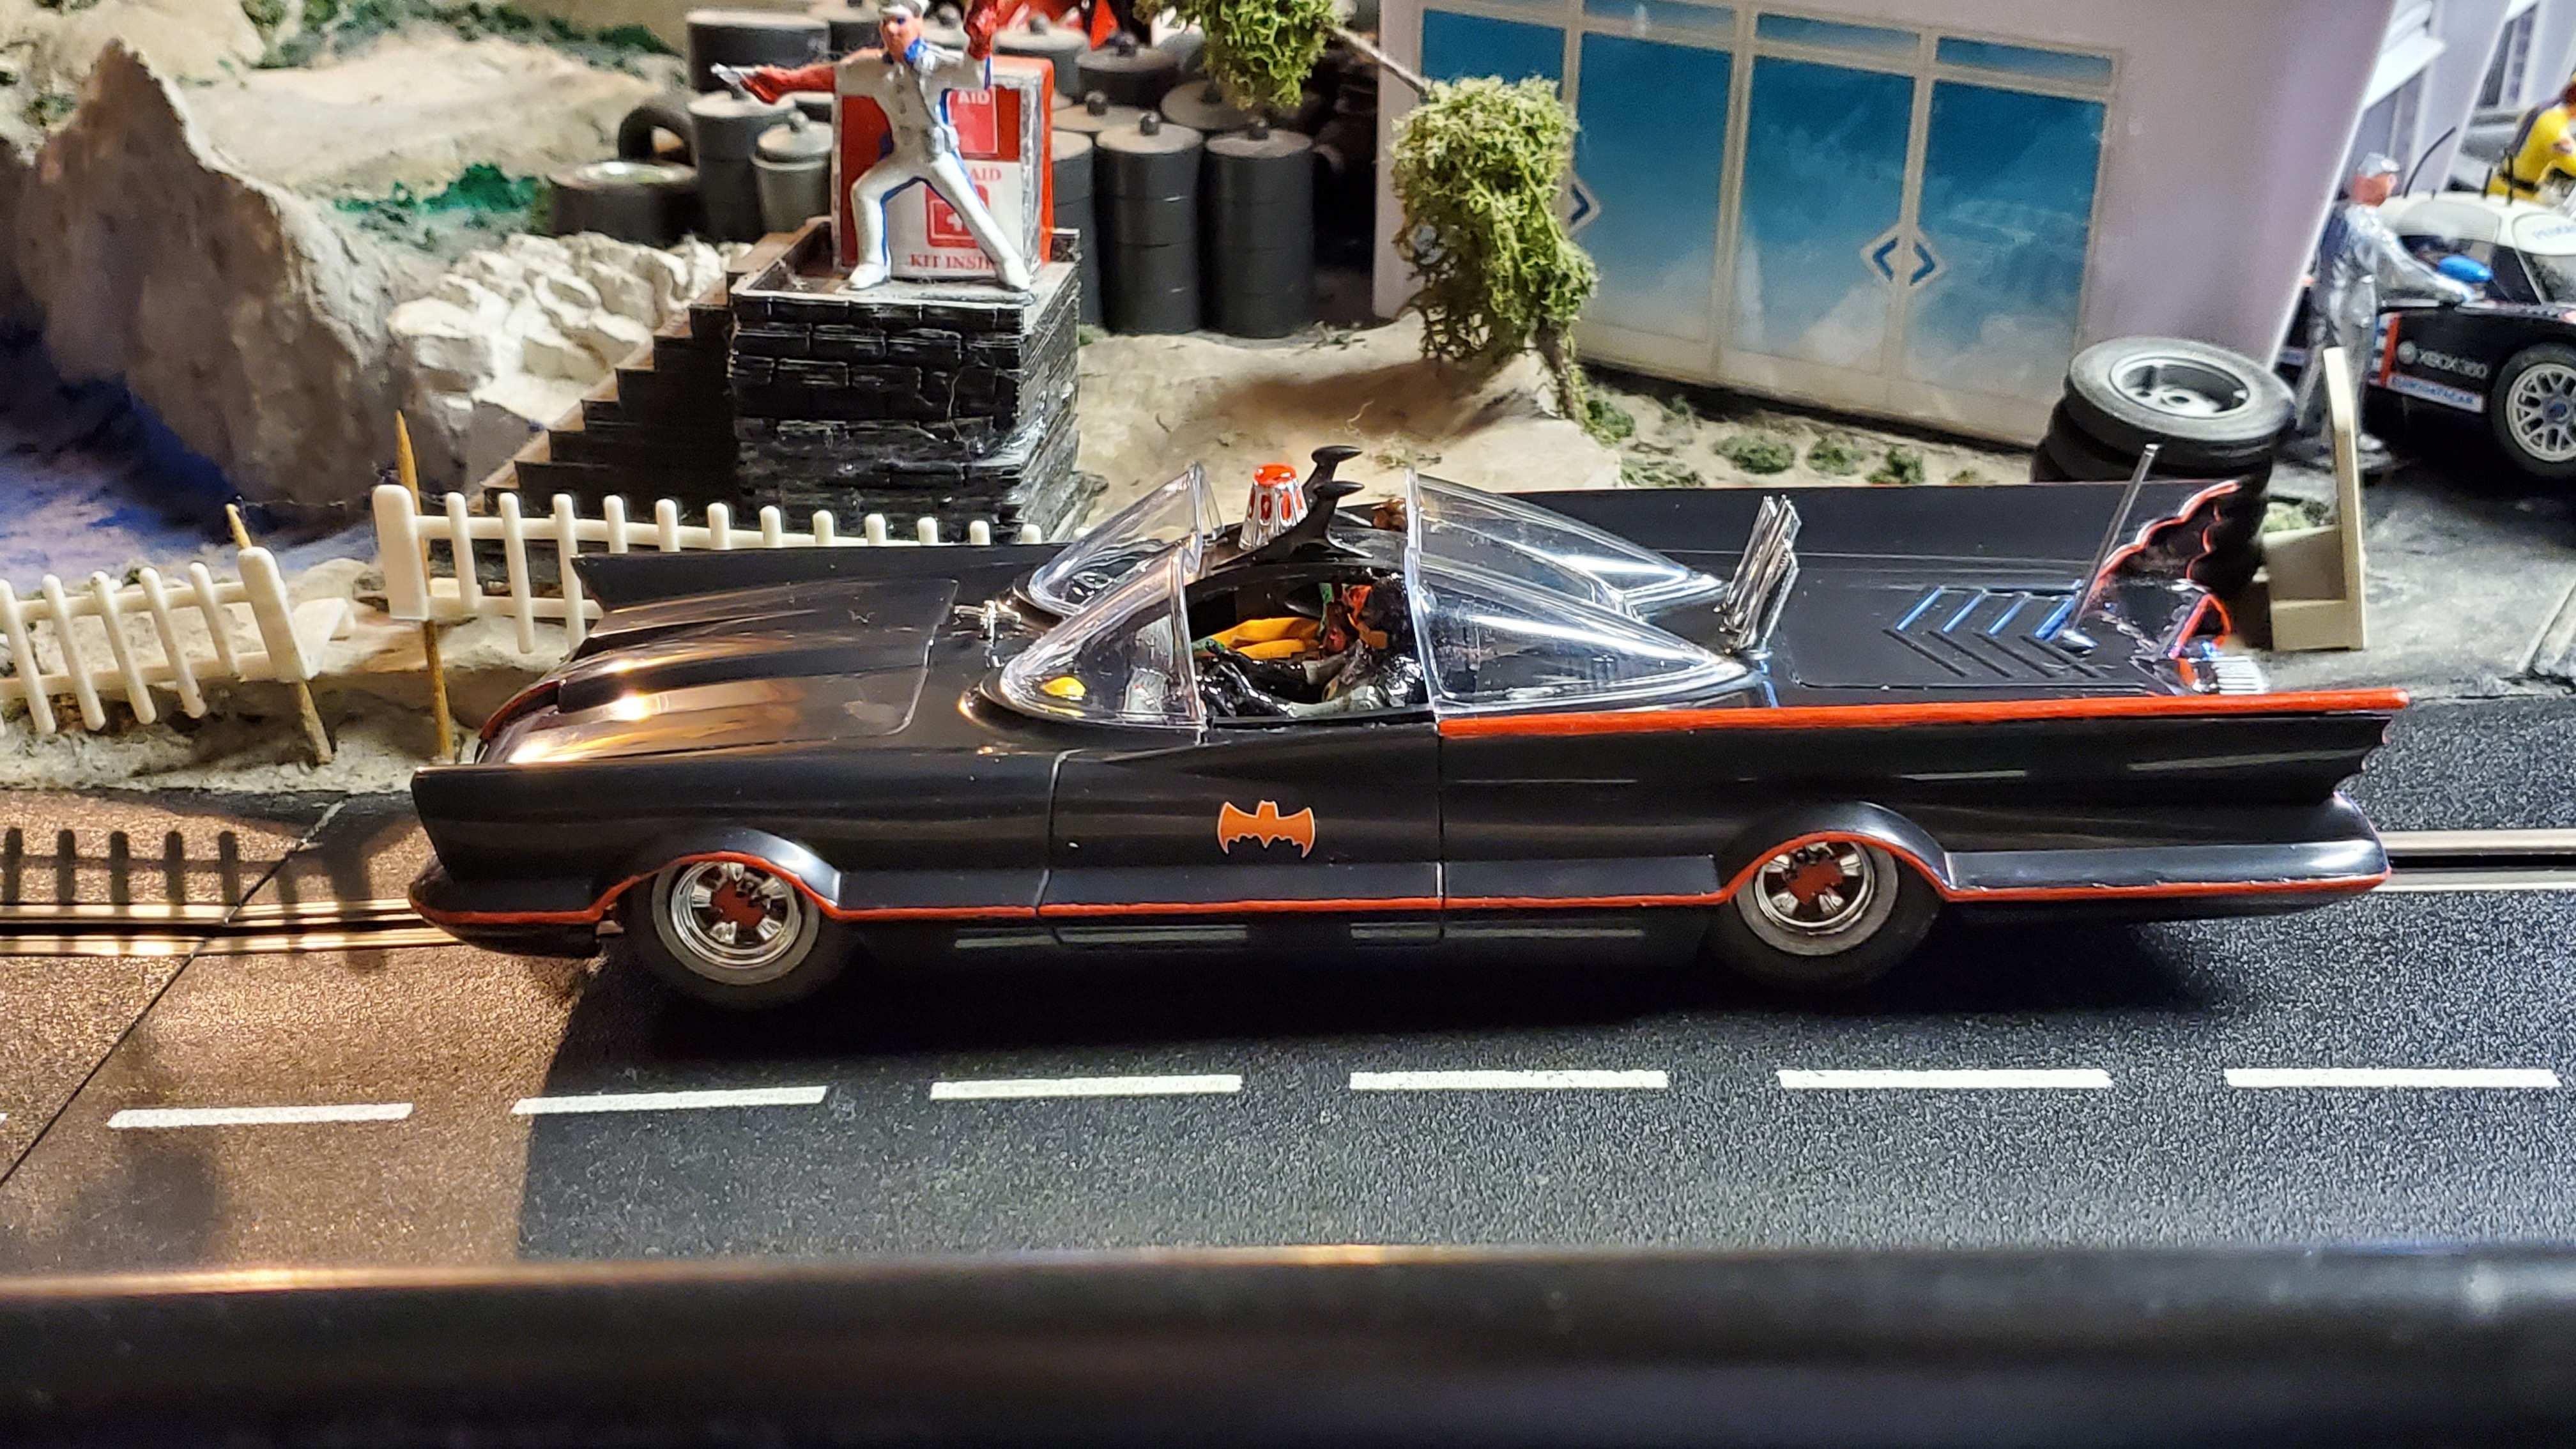 *SOLD* * SALE * Original Batmobile Slot Car with Batman & Robin Very Rare Limited Edition 1:24 Scale